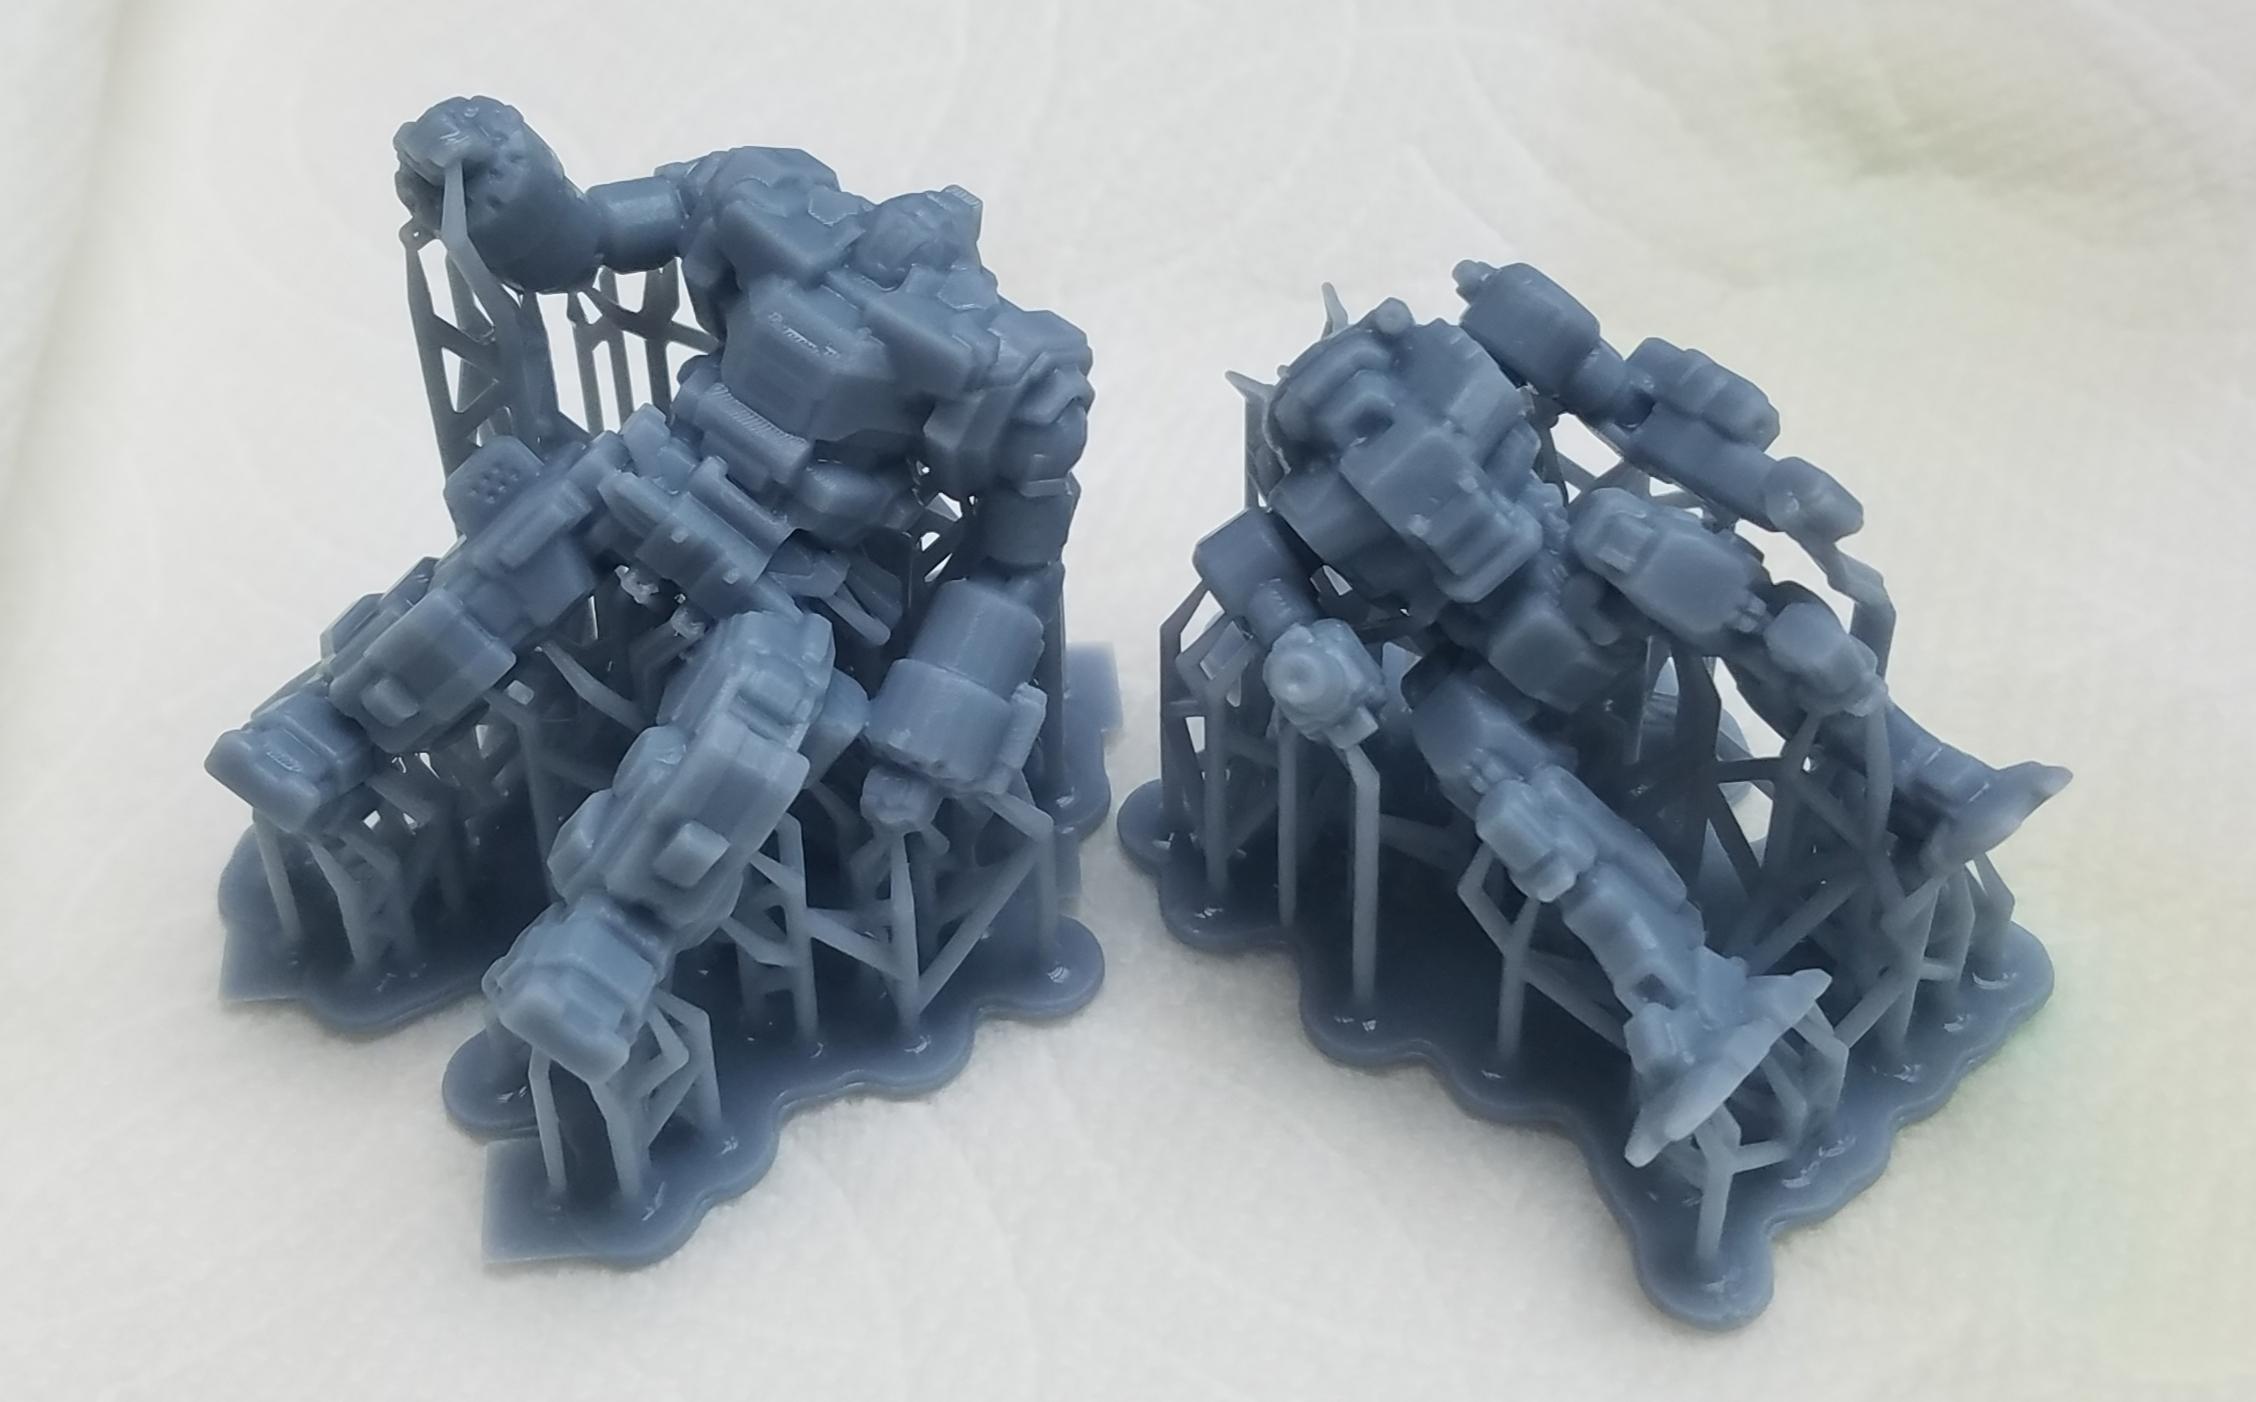 3d Printed, Anycubic, Battletech, Crusader, Mech, Photon, Vindicator